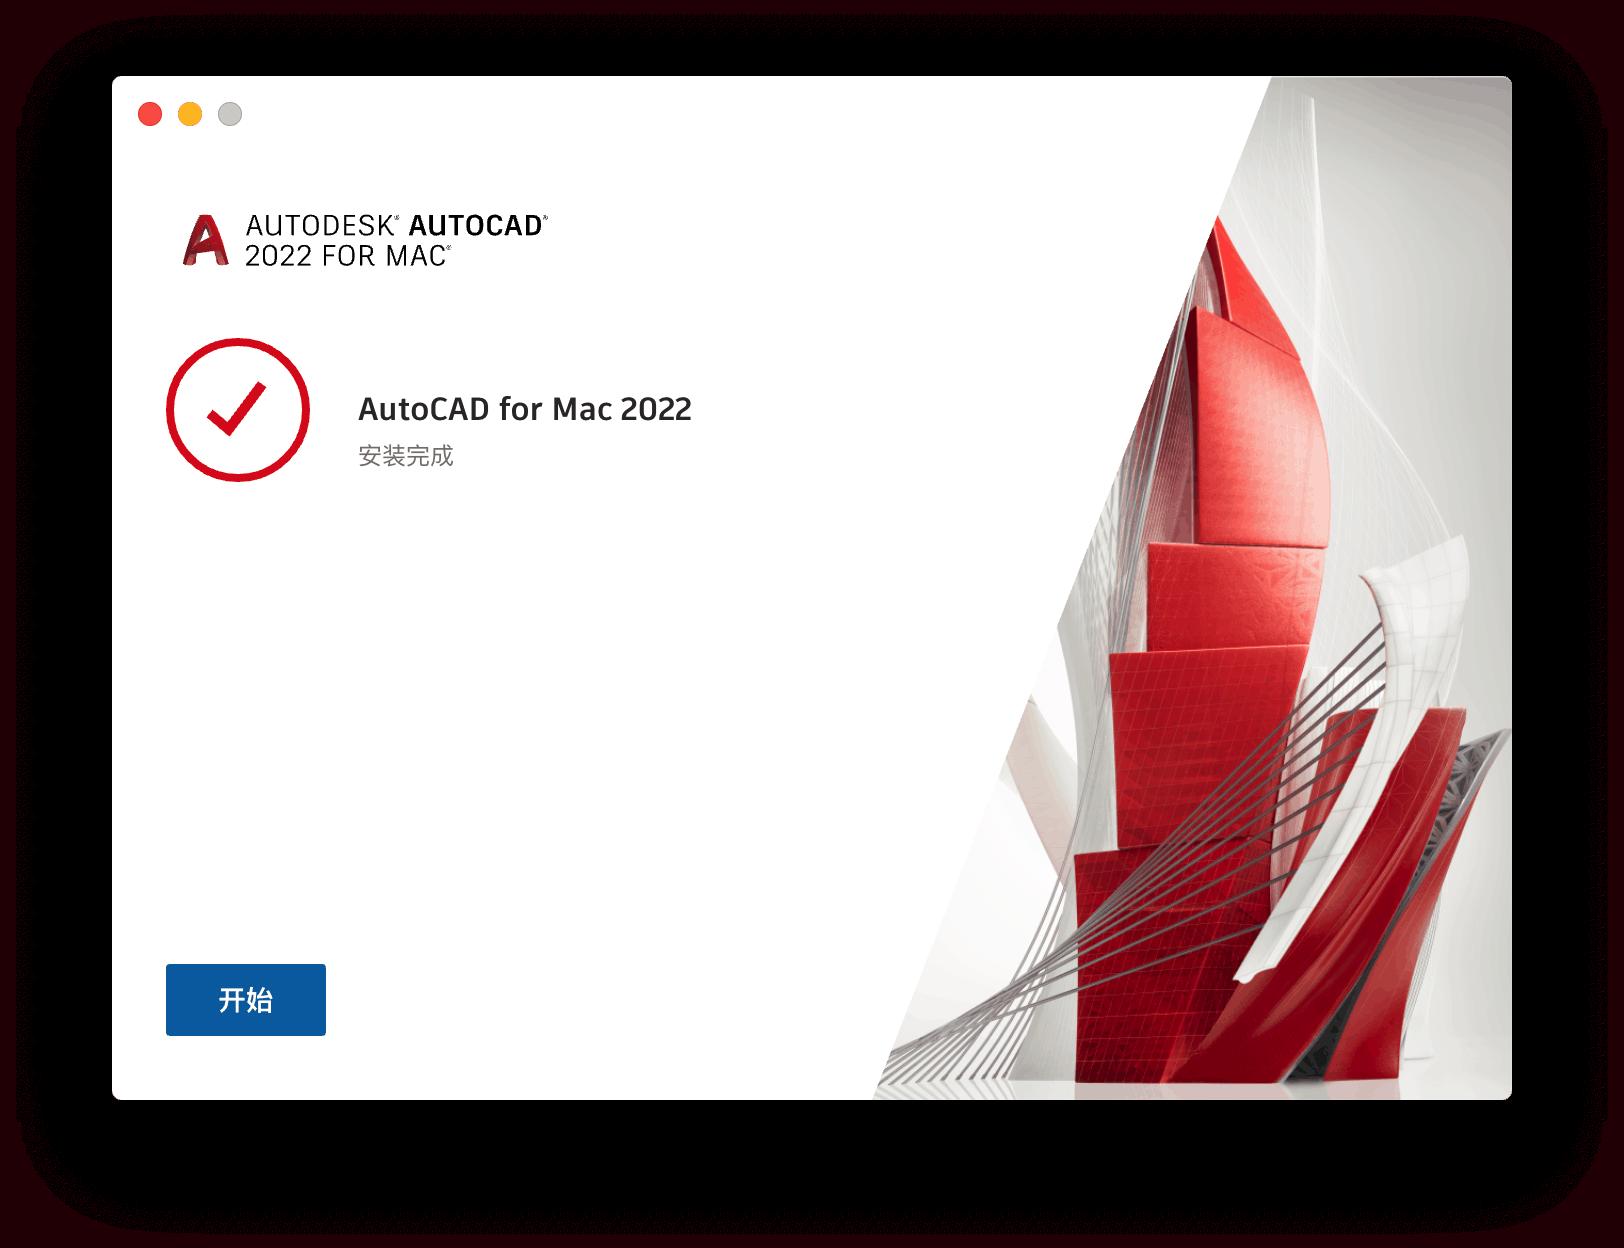 AutoCAD 2022 for Mac 中文版破解教程 Mac教程 第3张